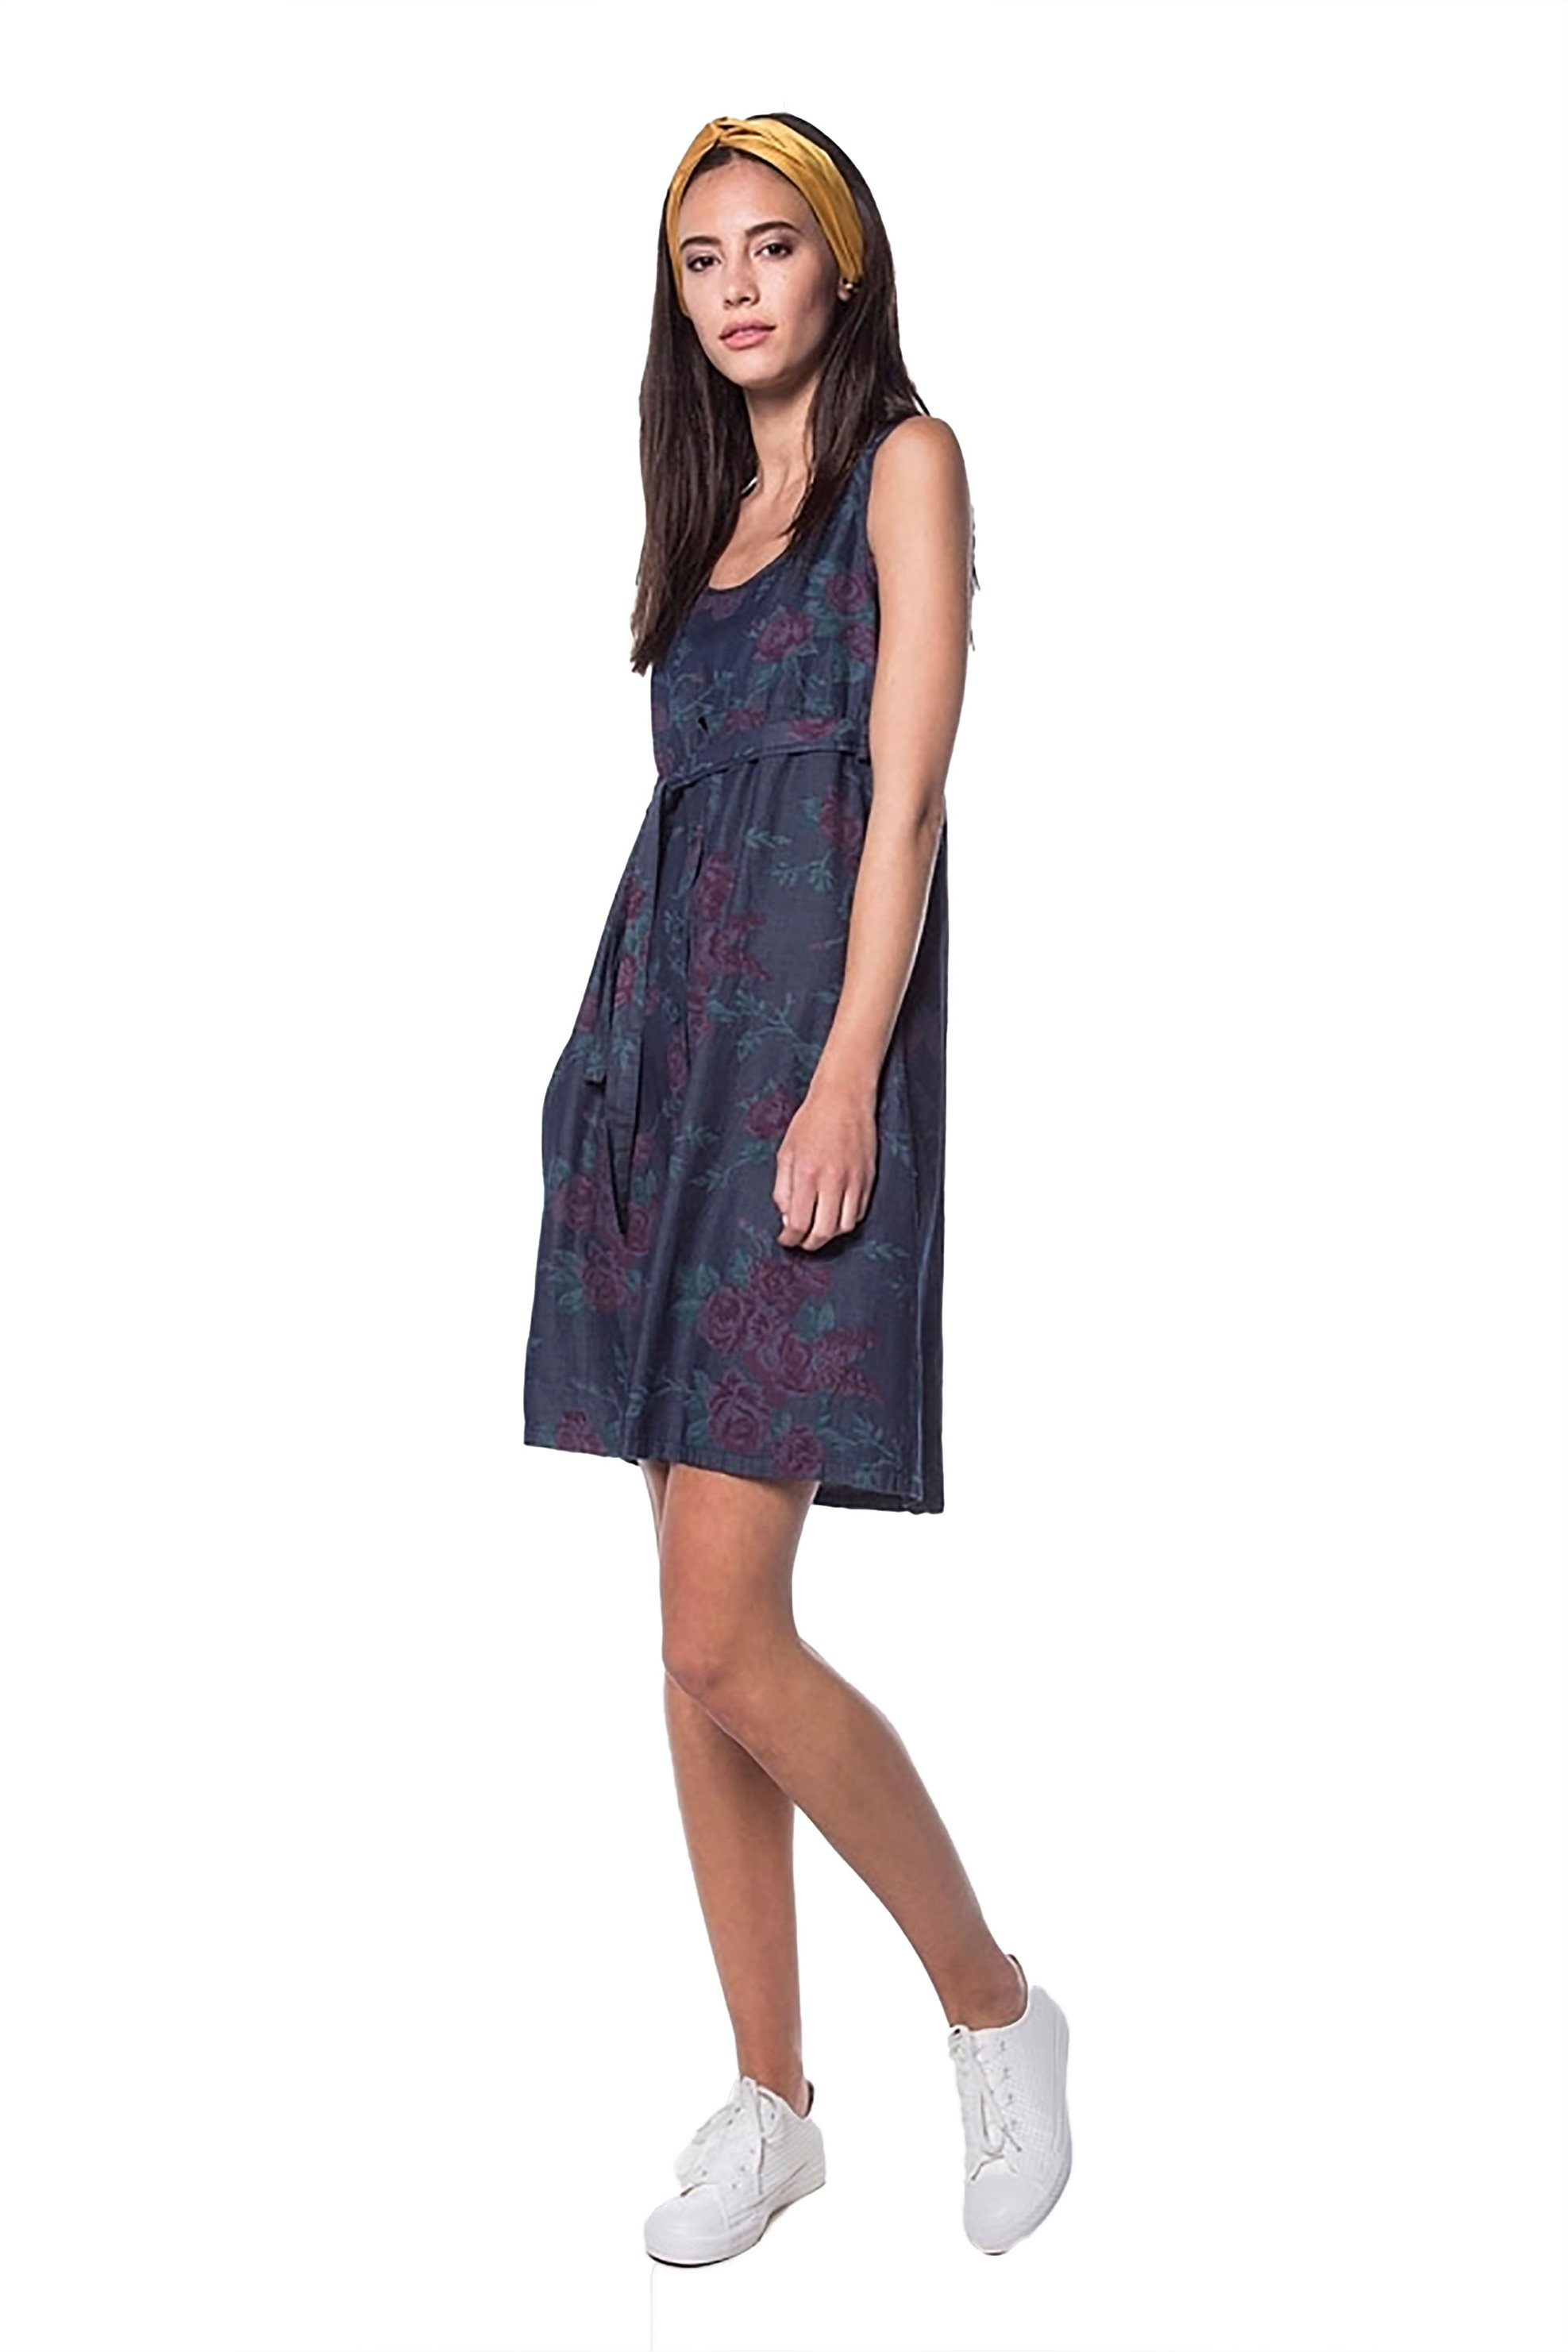 339c7a2d1f0a Γυναικεία   Ρούχα   Φορέματα   Καθημερινά   9173 GB Μίνι φλοράλ ...